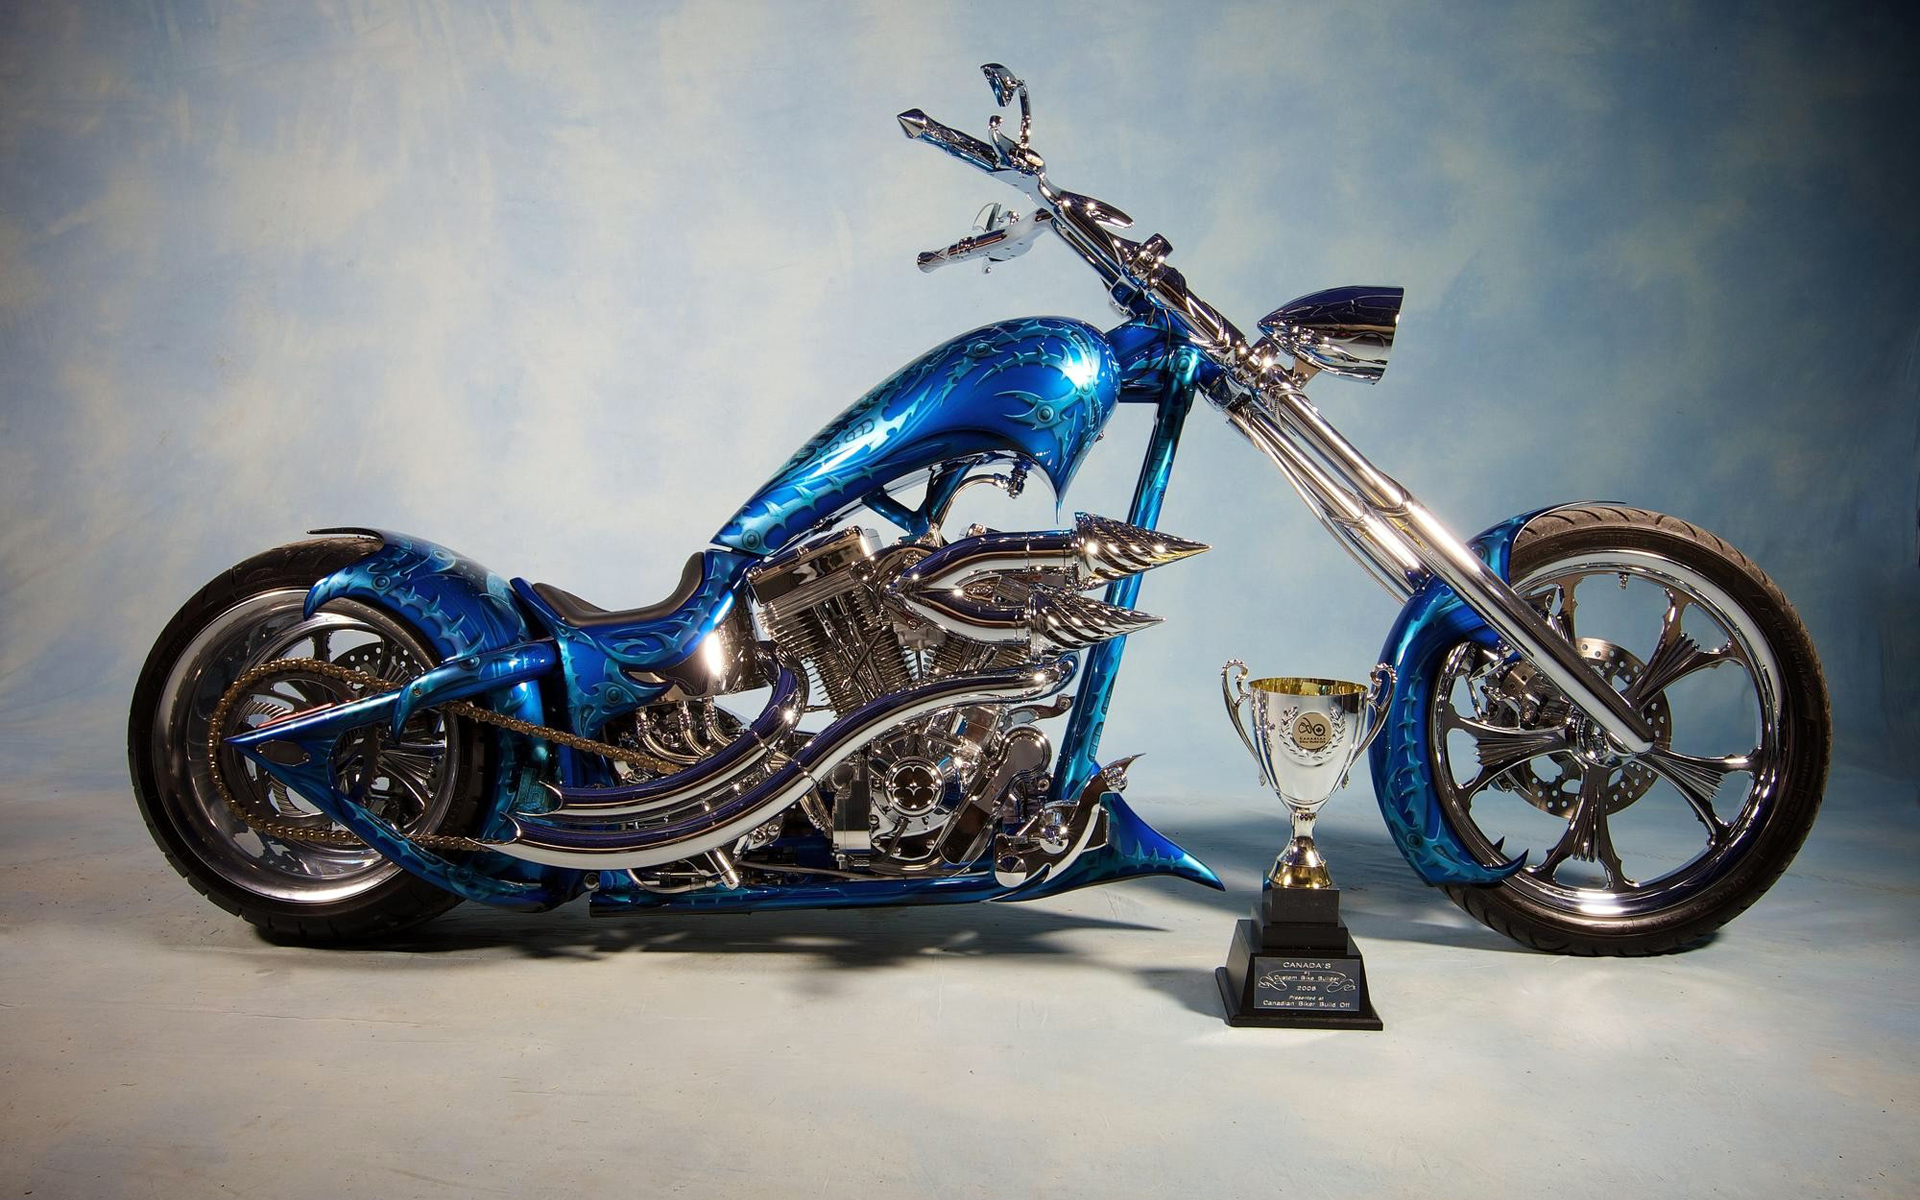 Blue Modified Bike Hd Wallpaper: [40+] HD Wallpapers Motorcycles And Girls On WallpaperSafari